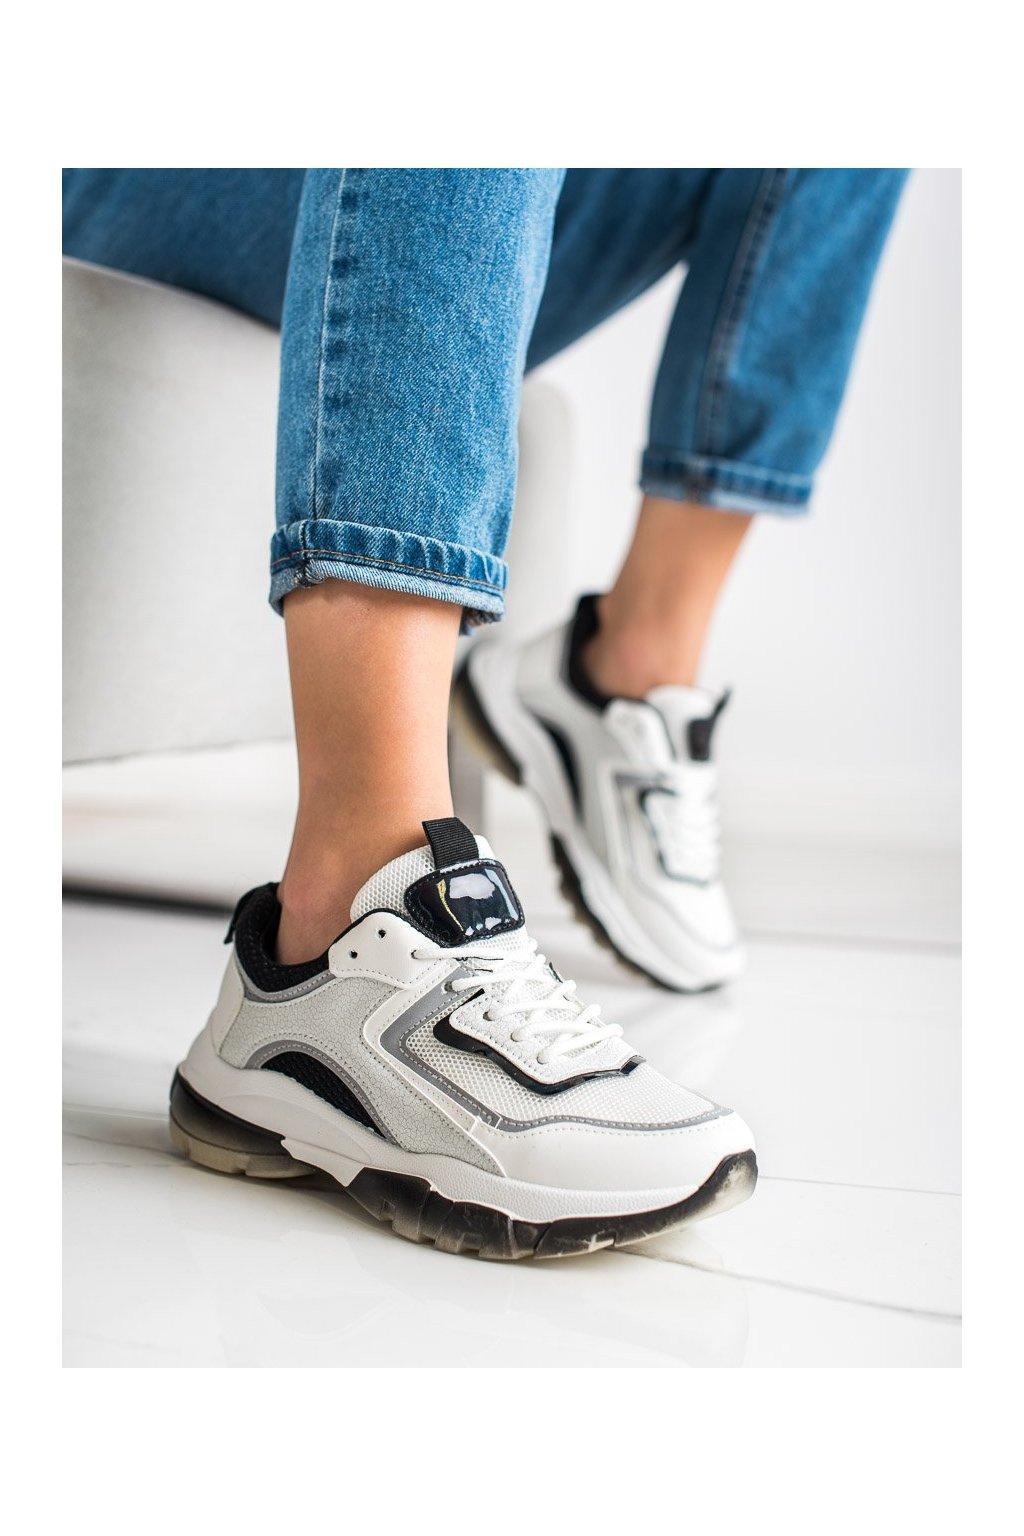 Biele tenisky Ideal shoes kod 9796B